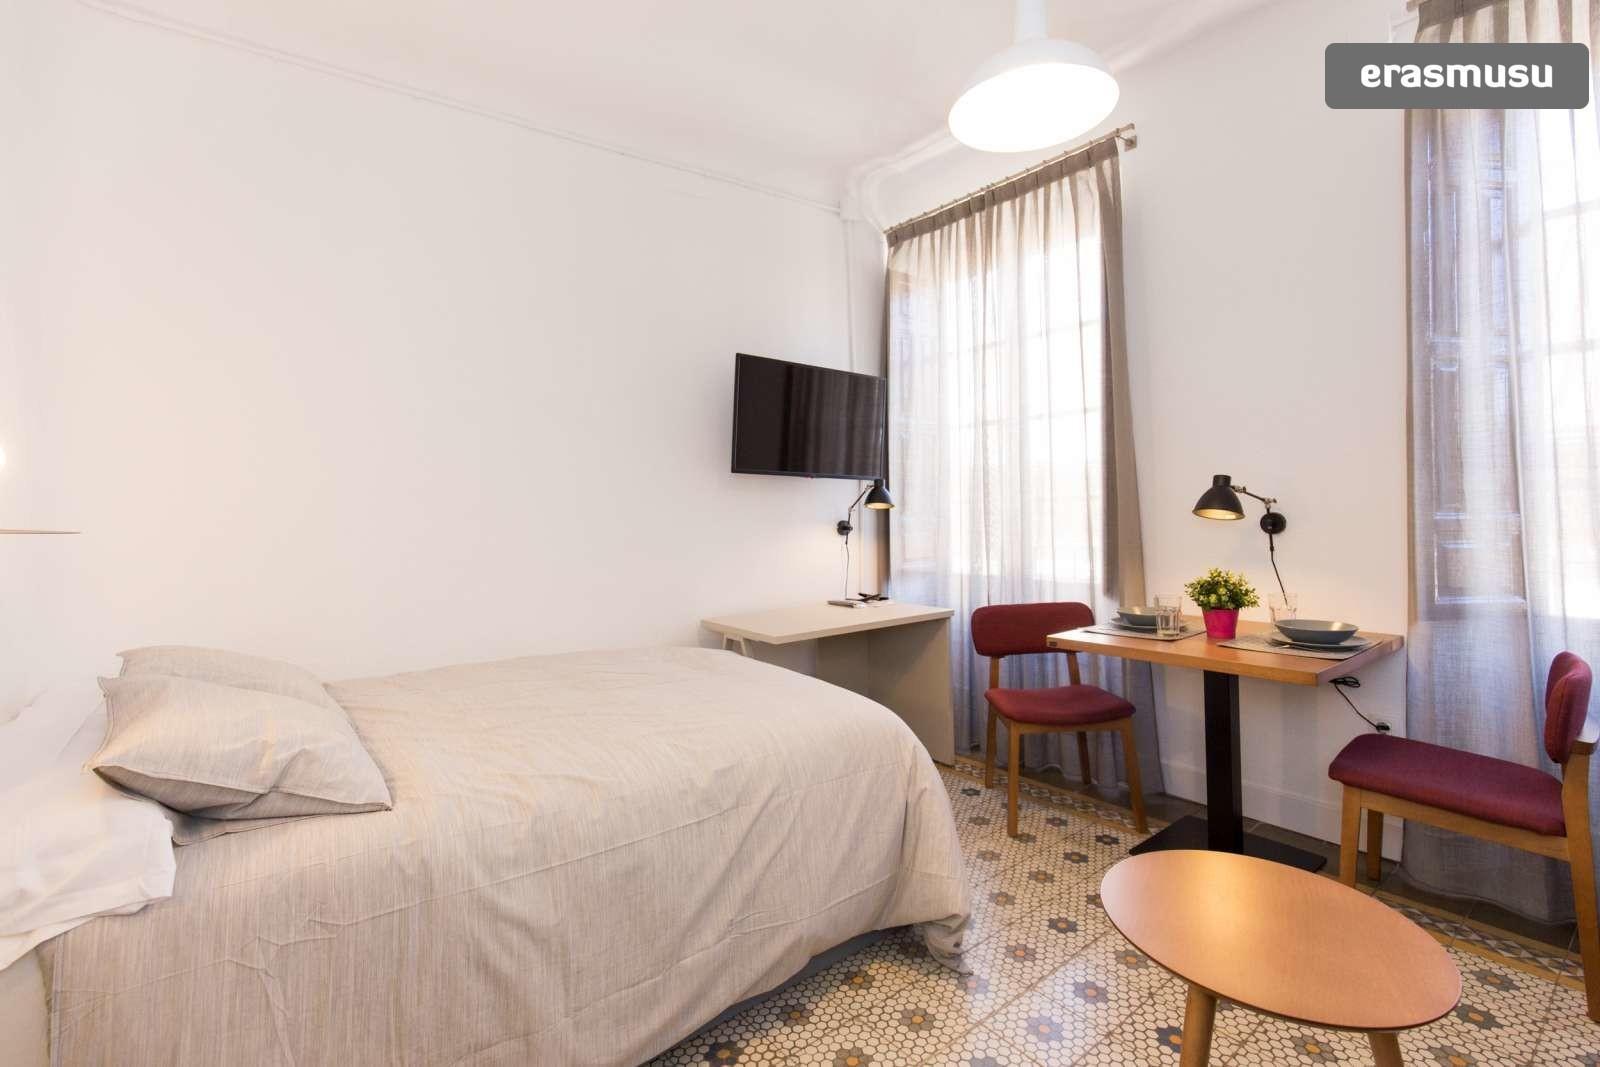 charming-studio-apartment-rent-city-centre-526f87c1a88483105ae0d